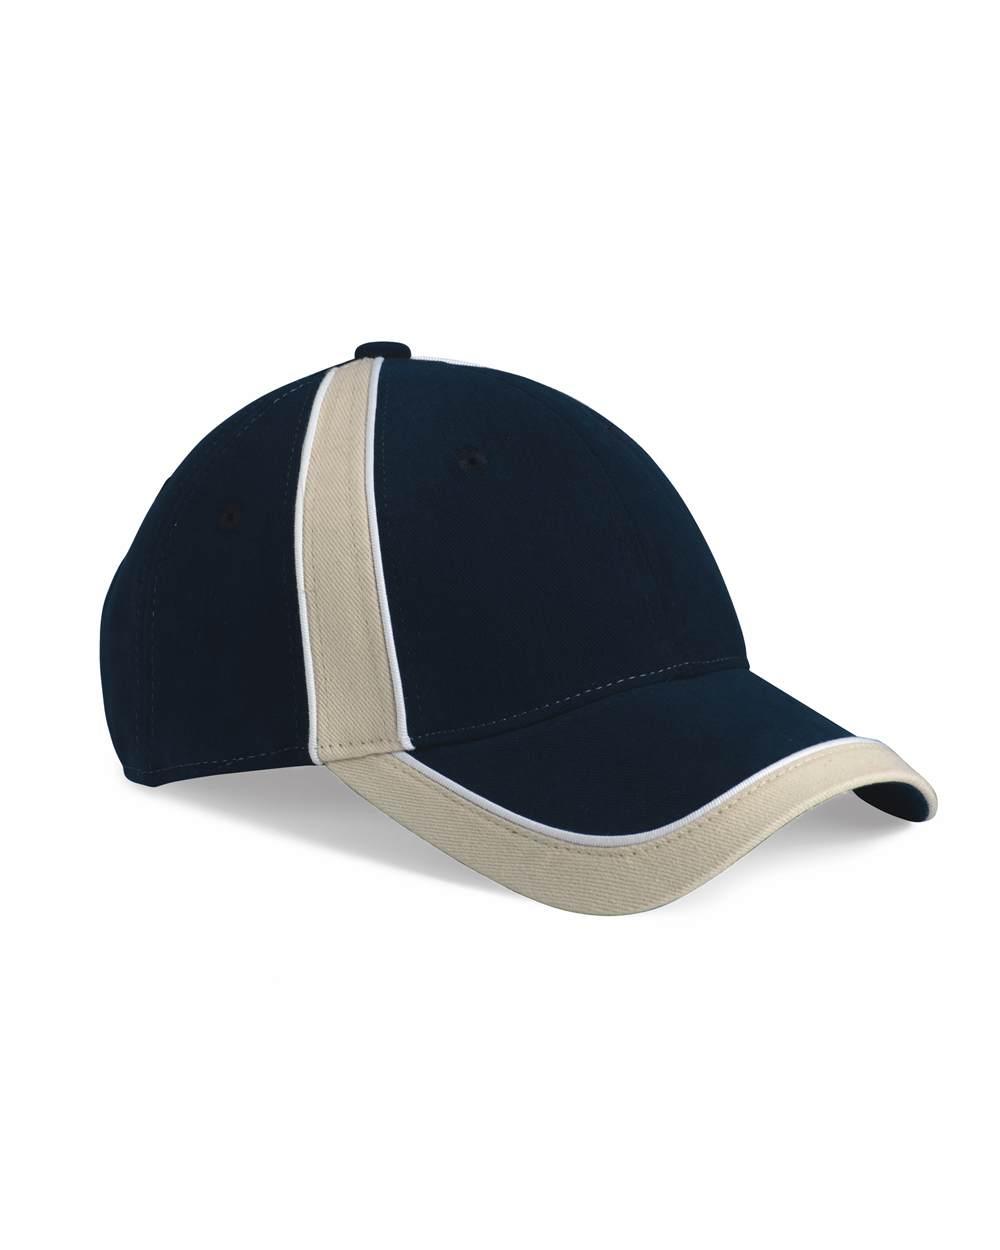 Sportsman Cap 9400 Striper Cap